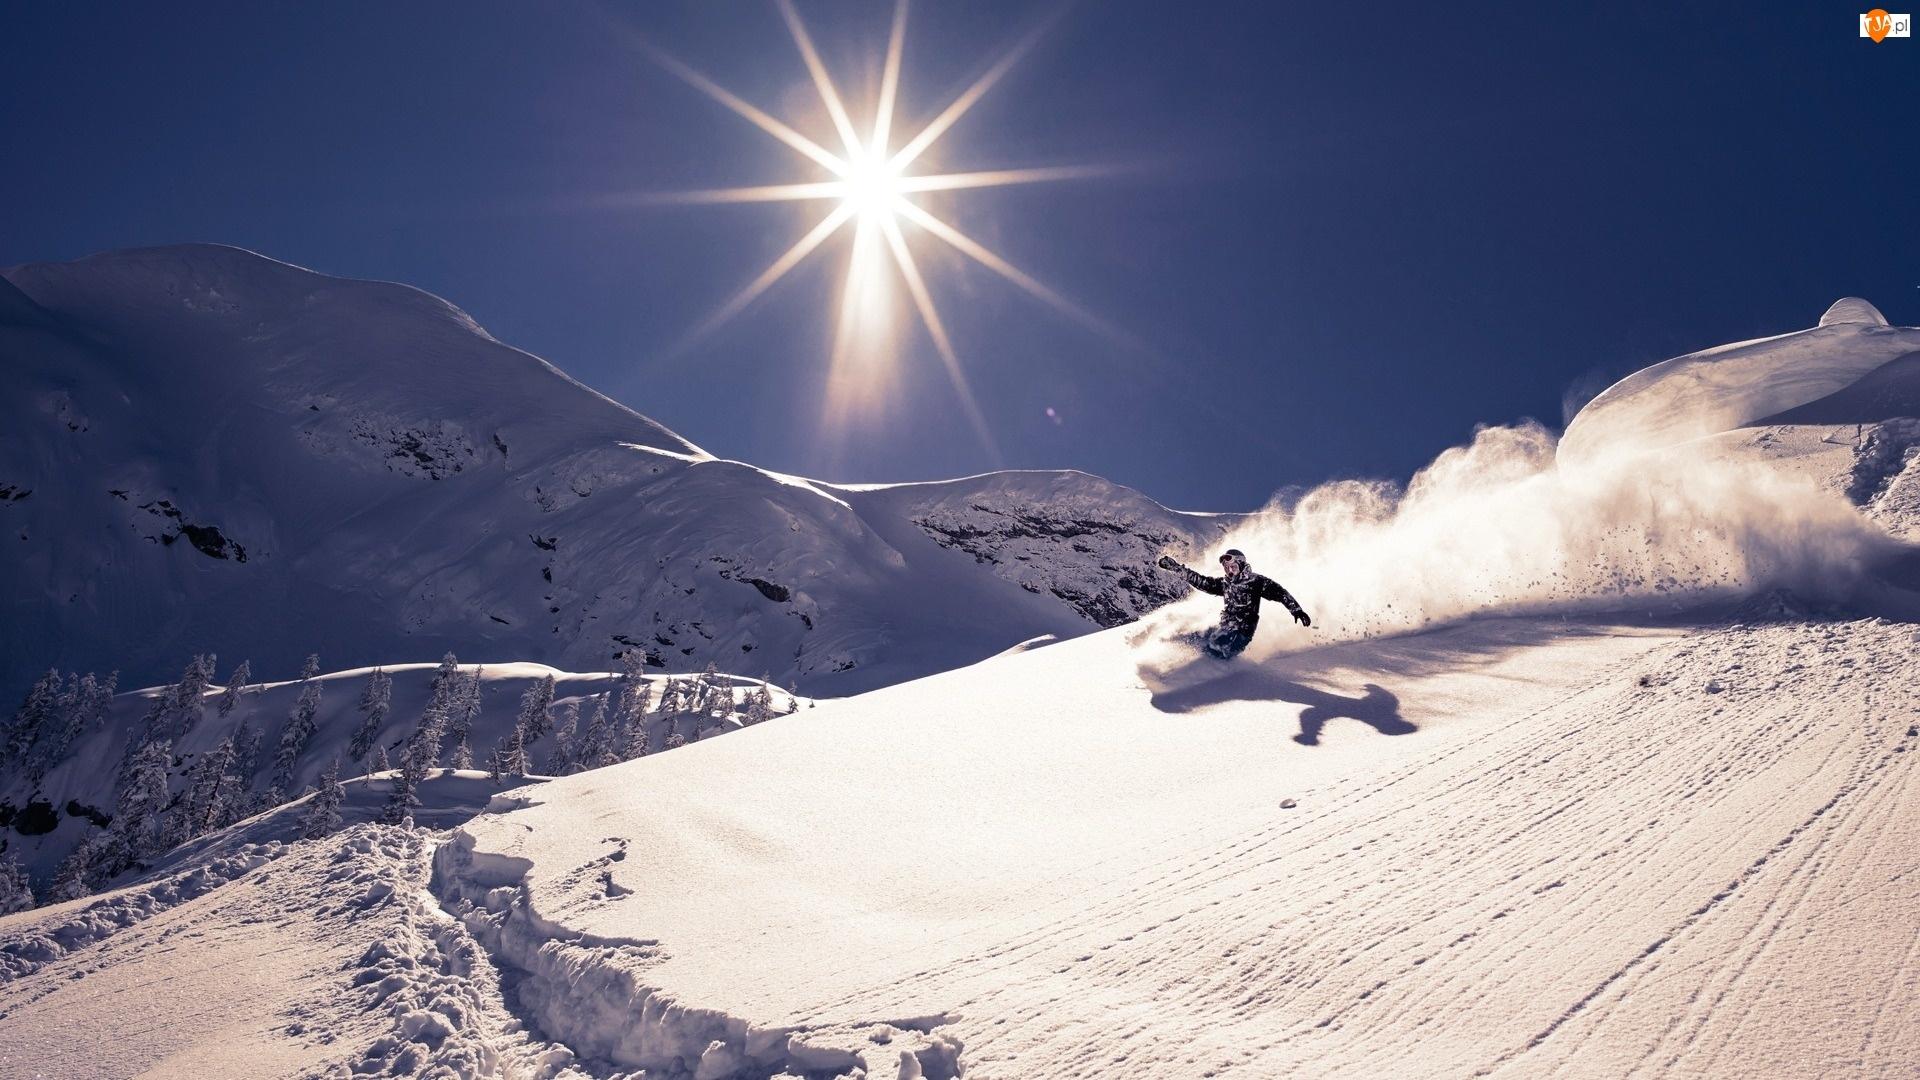 Zima, Snowbord, Góry, Słońce